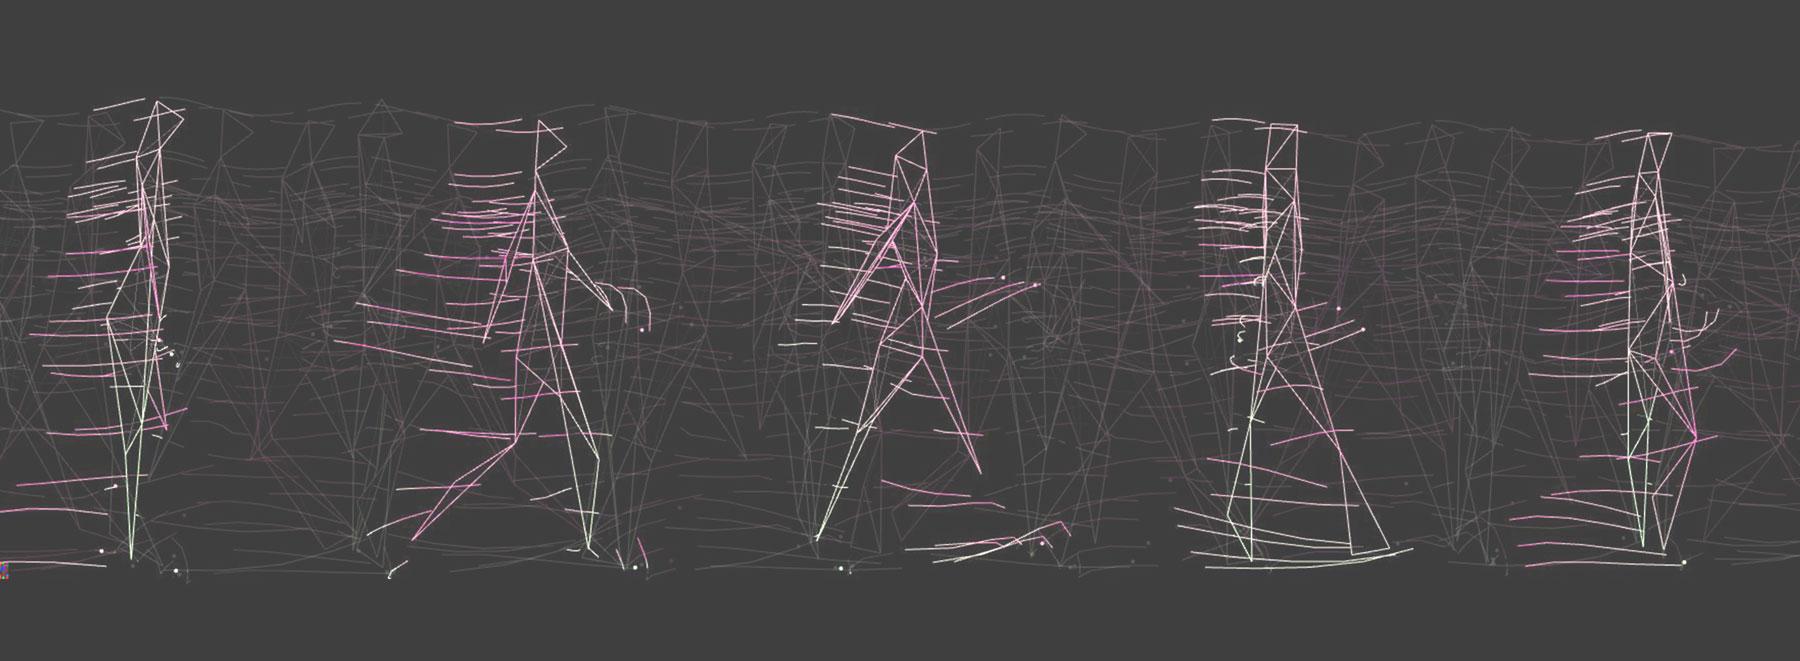 walk_visualization_001.jpg